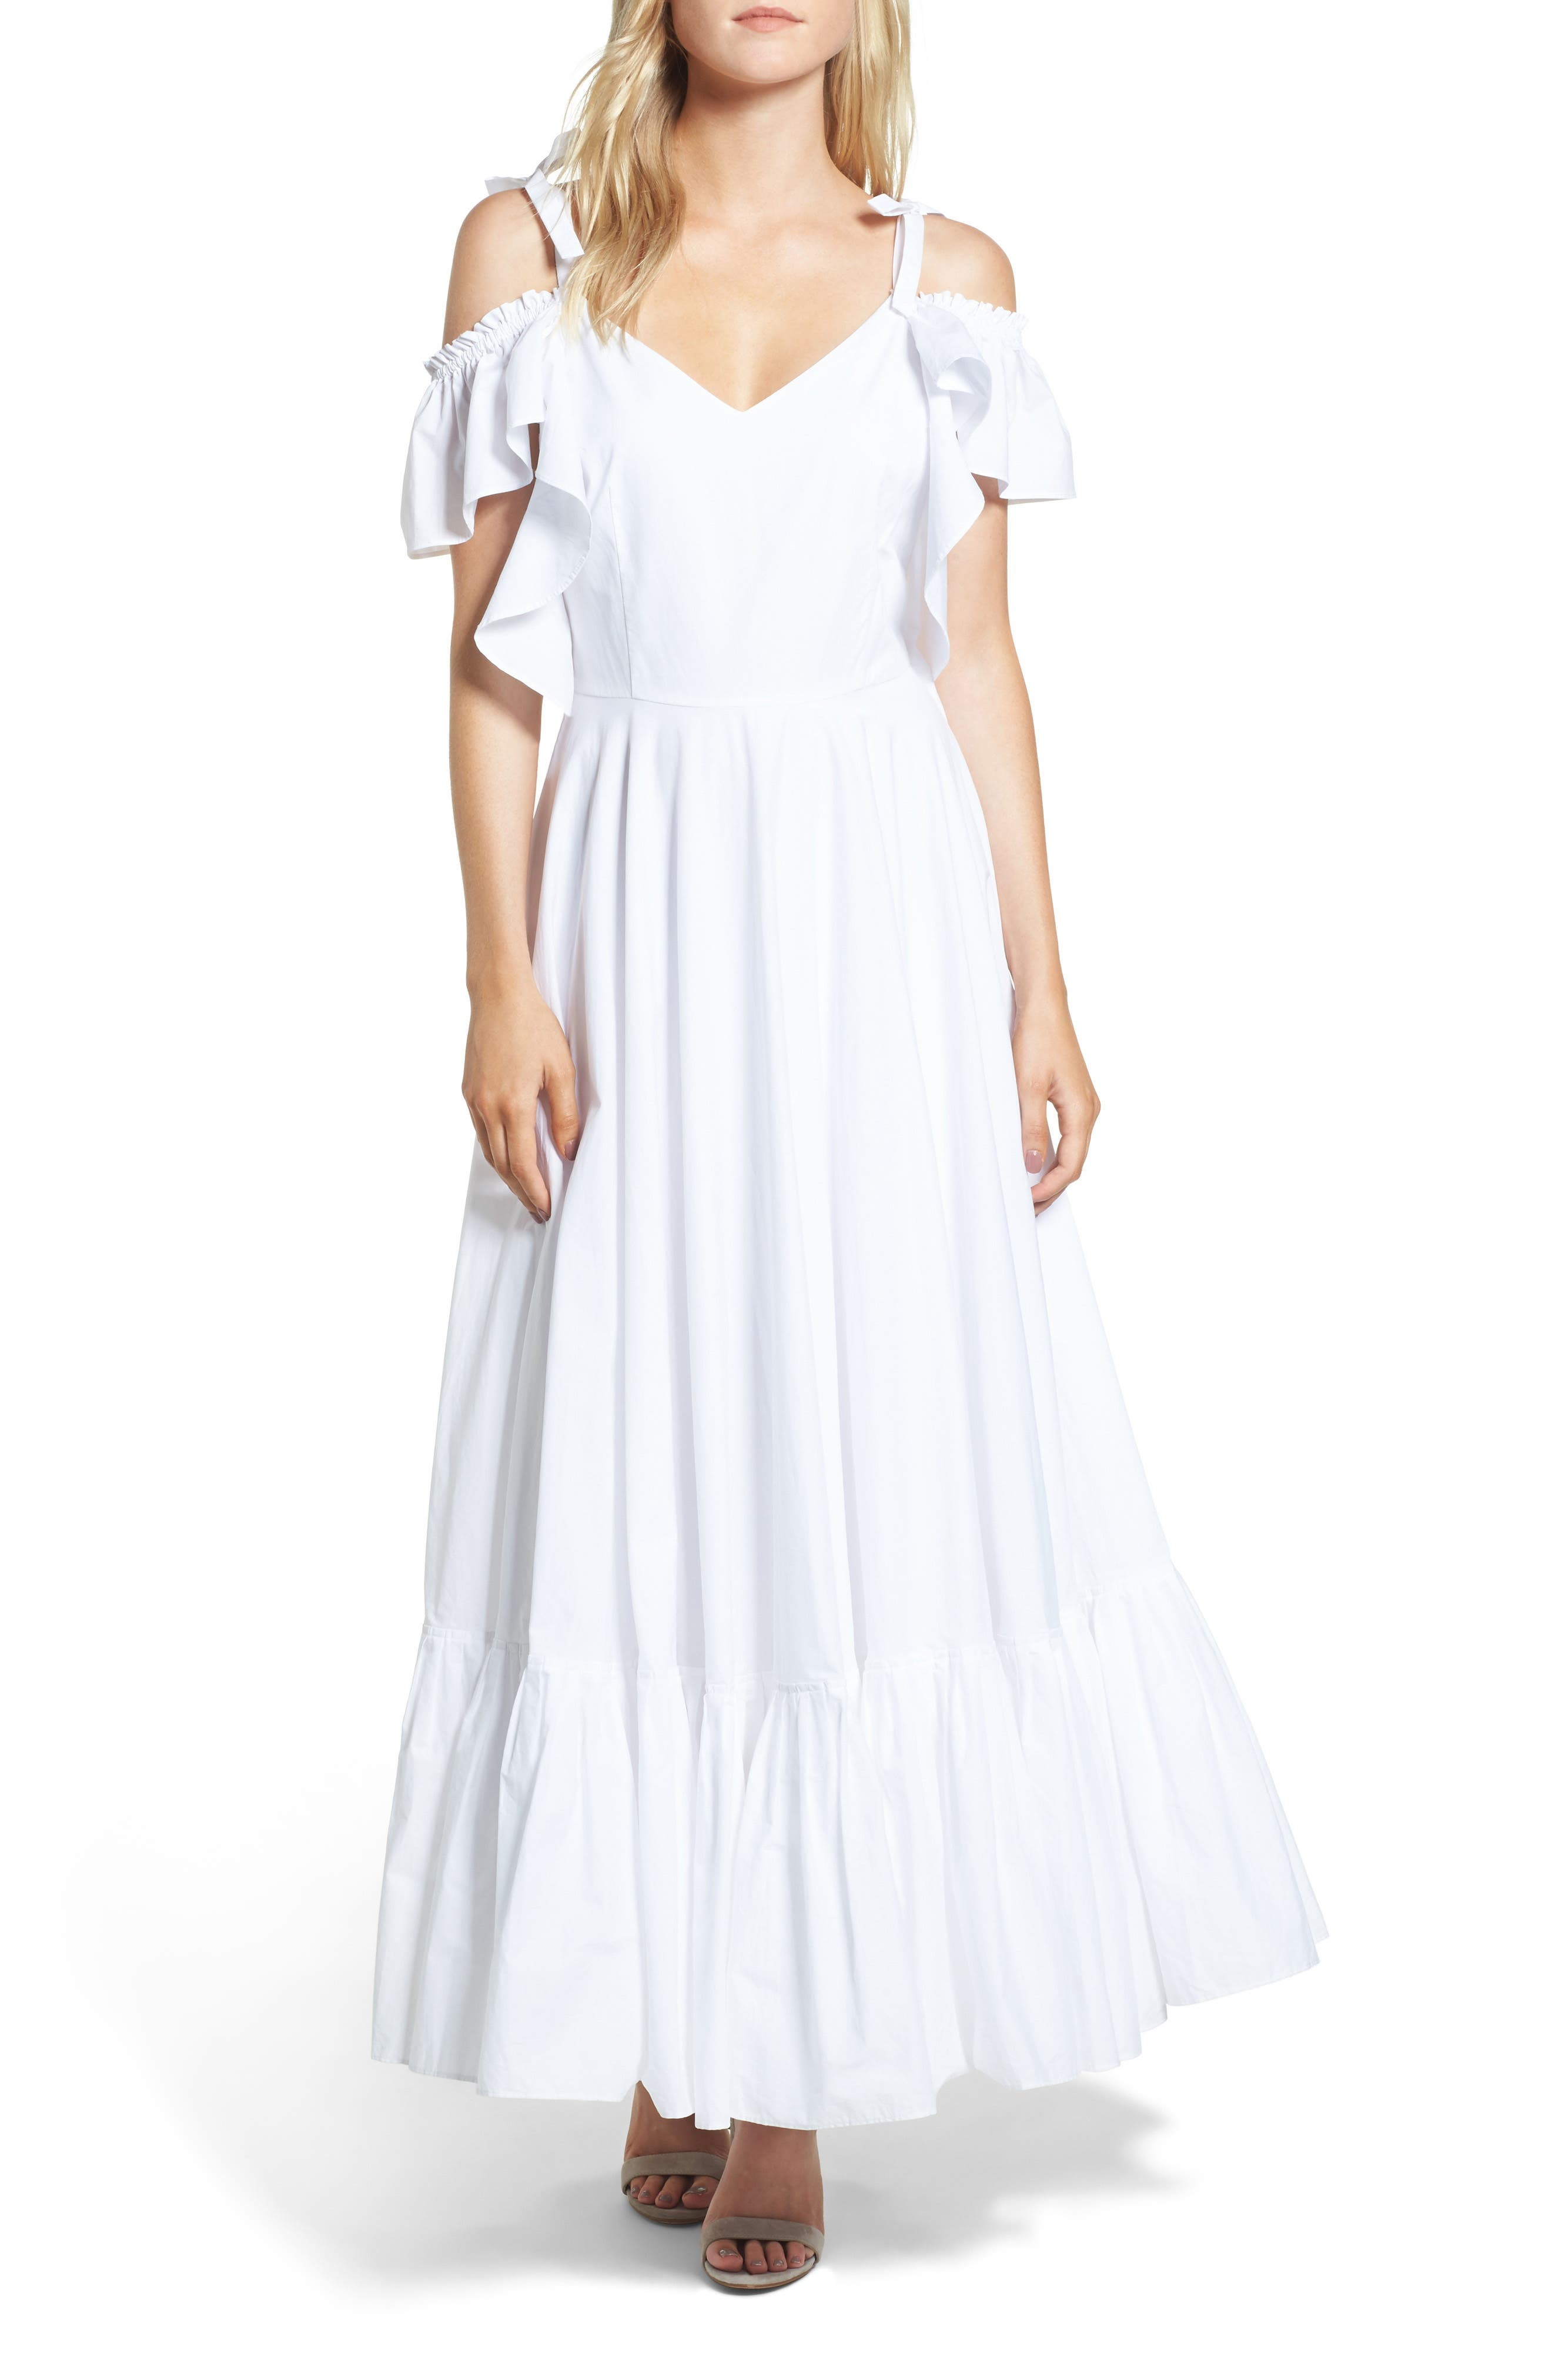 Lake Como Maxi Dress,                             Main thumbnail 1, color,                             White